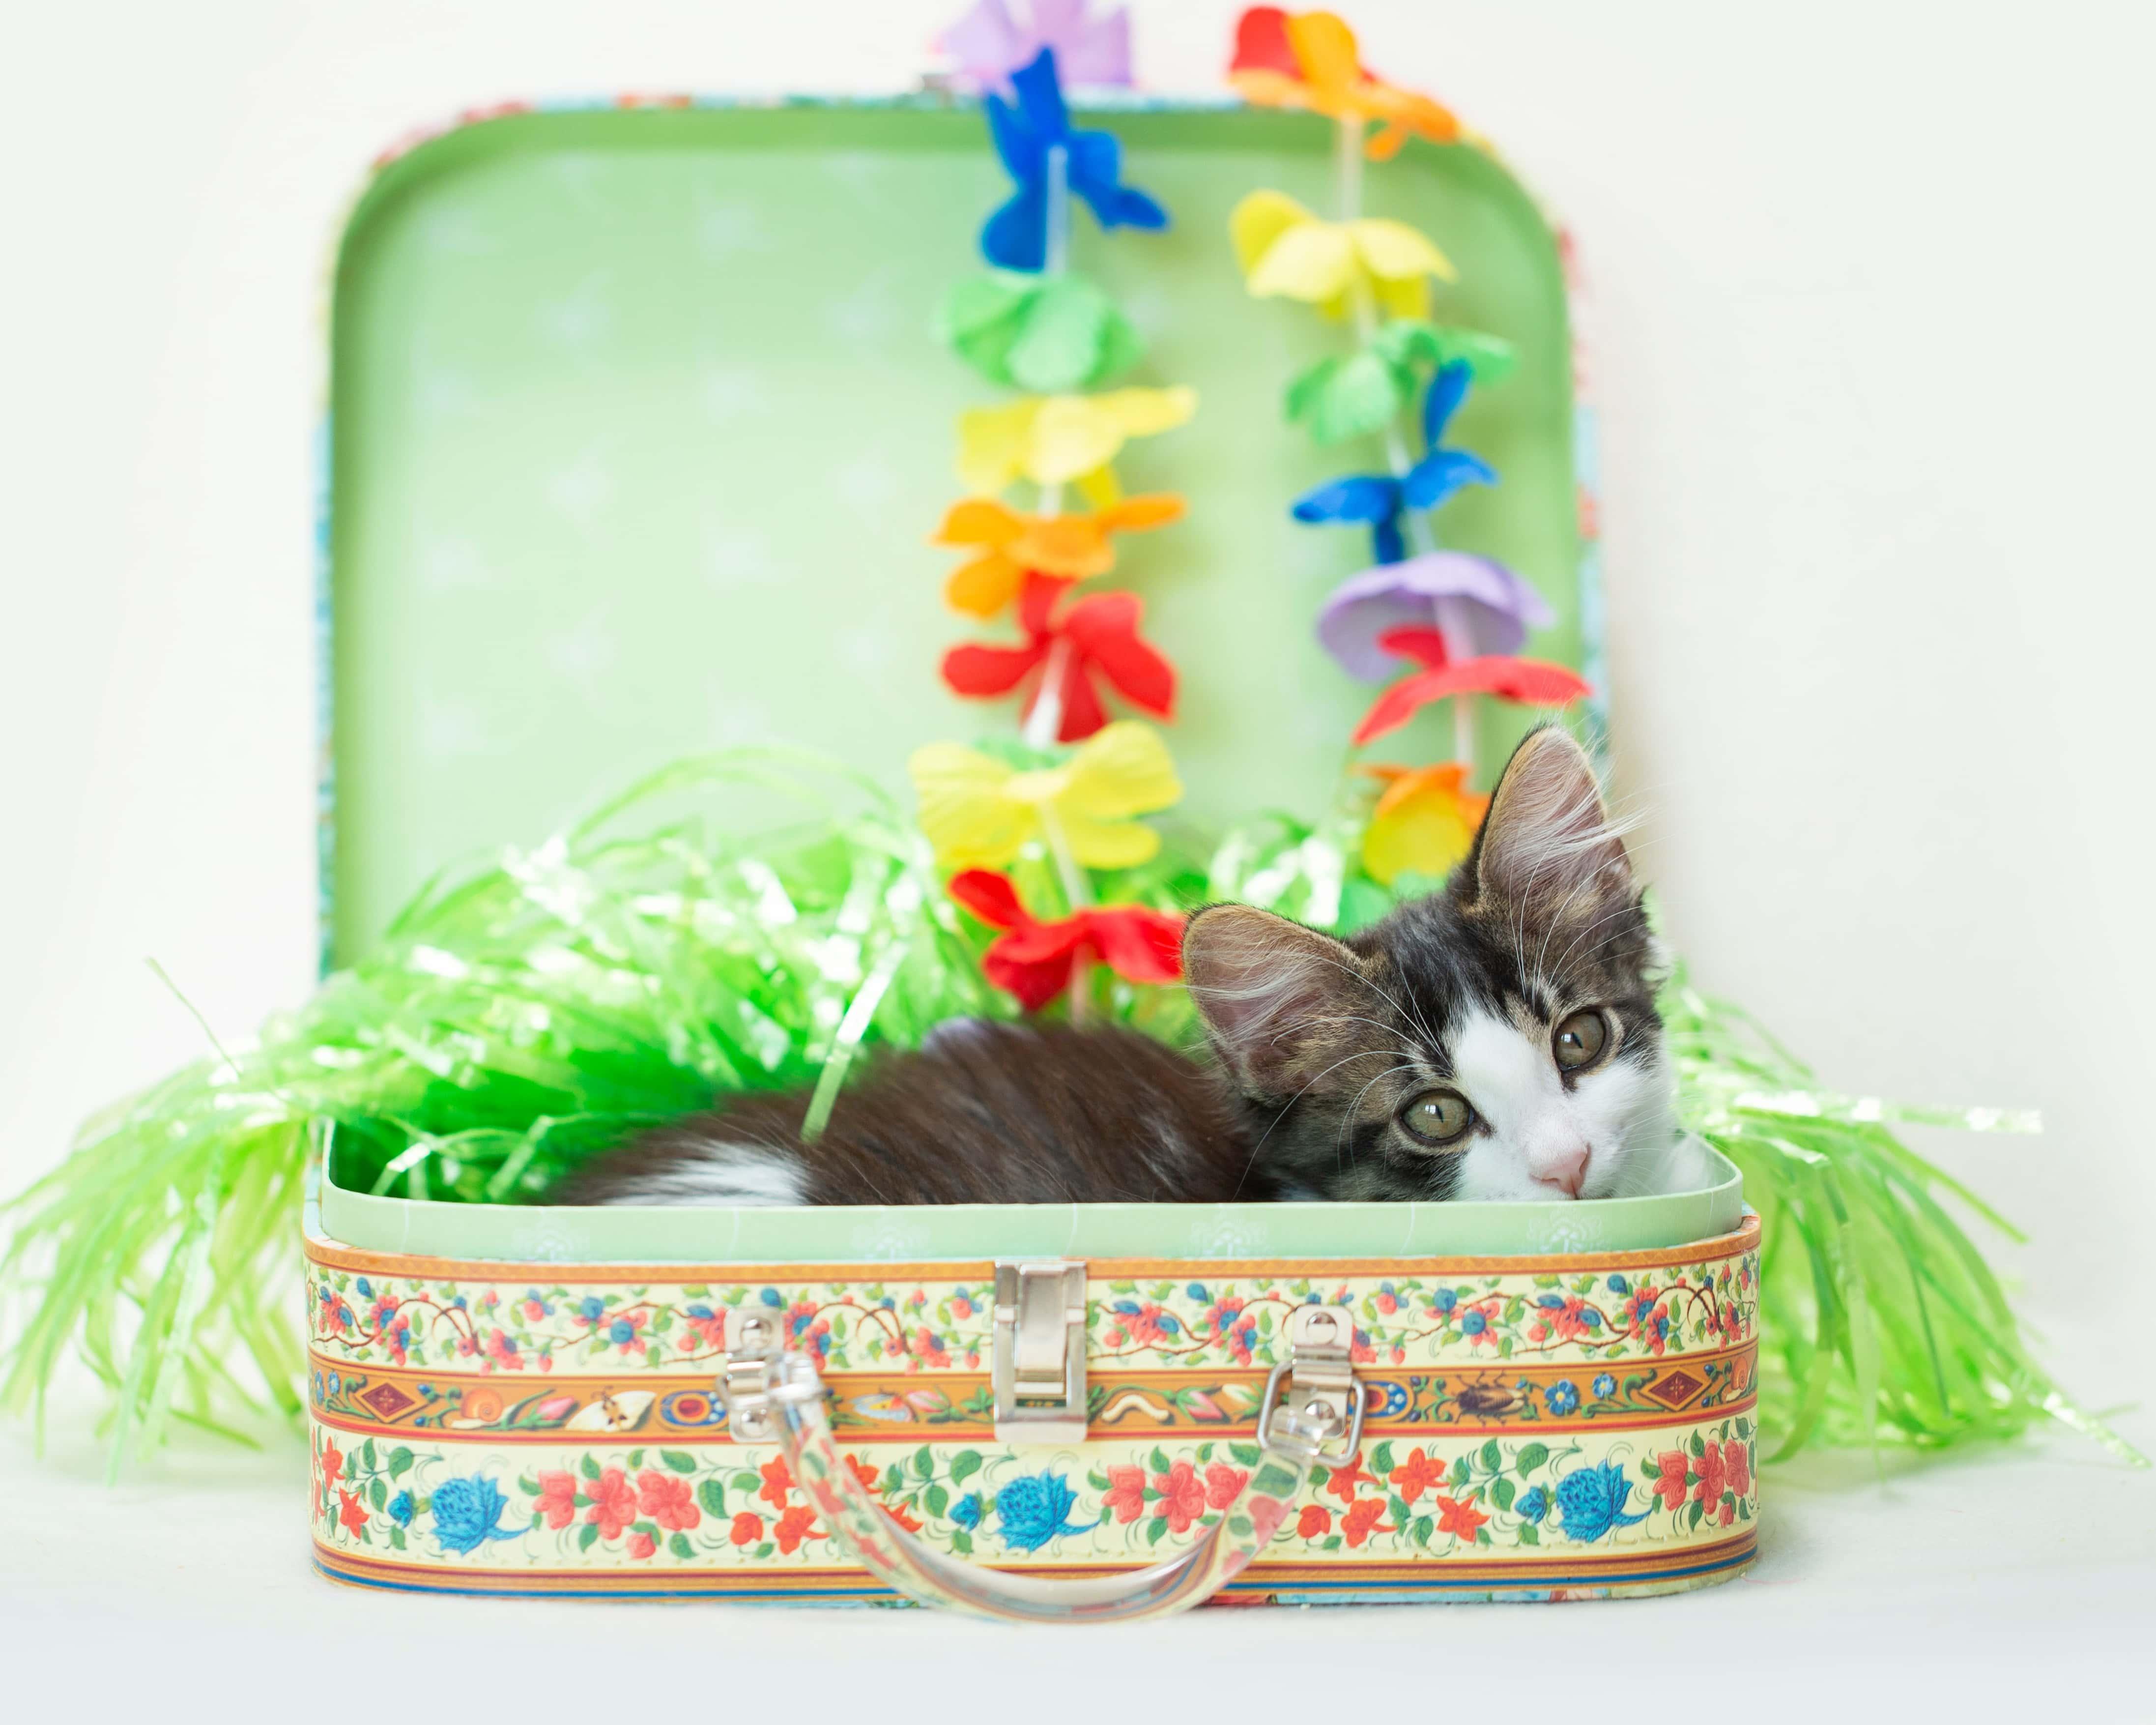 Hawaiian cat in suitcase